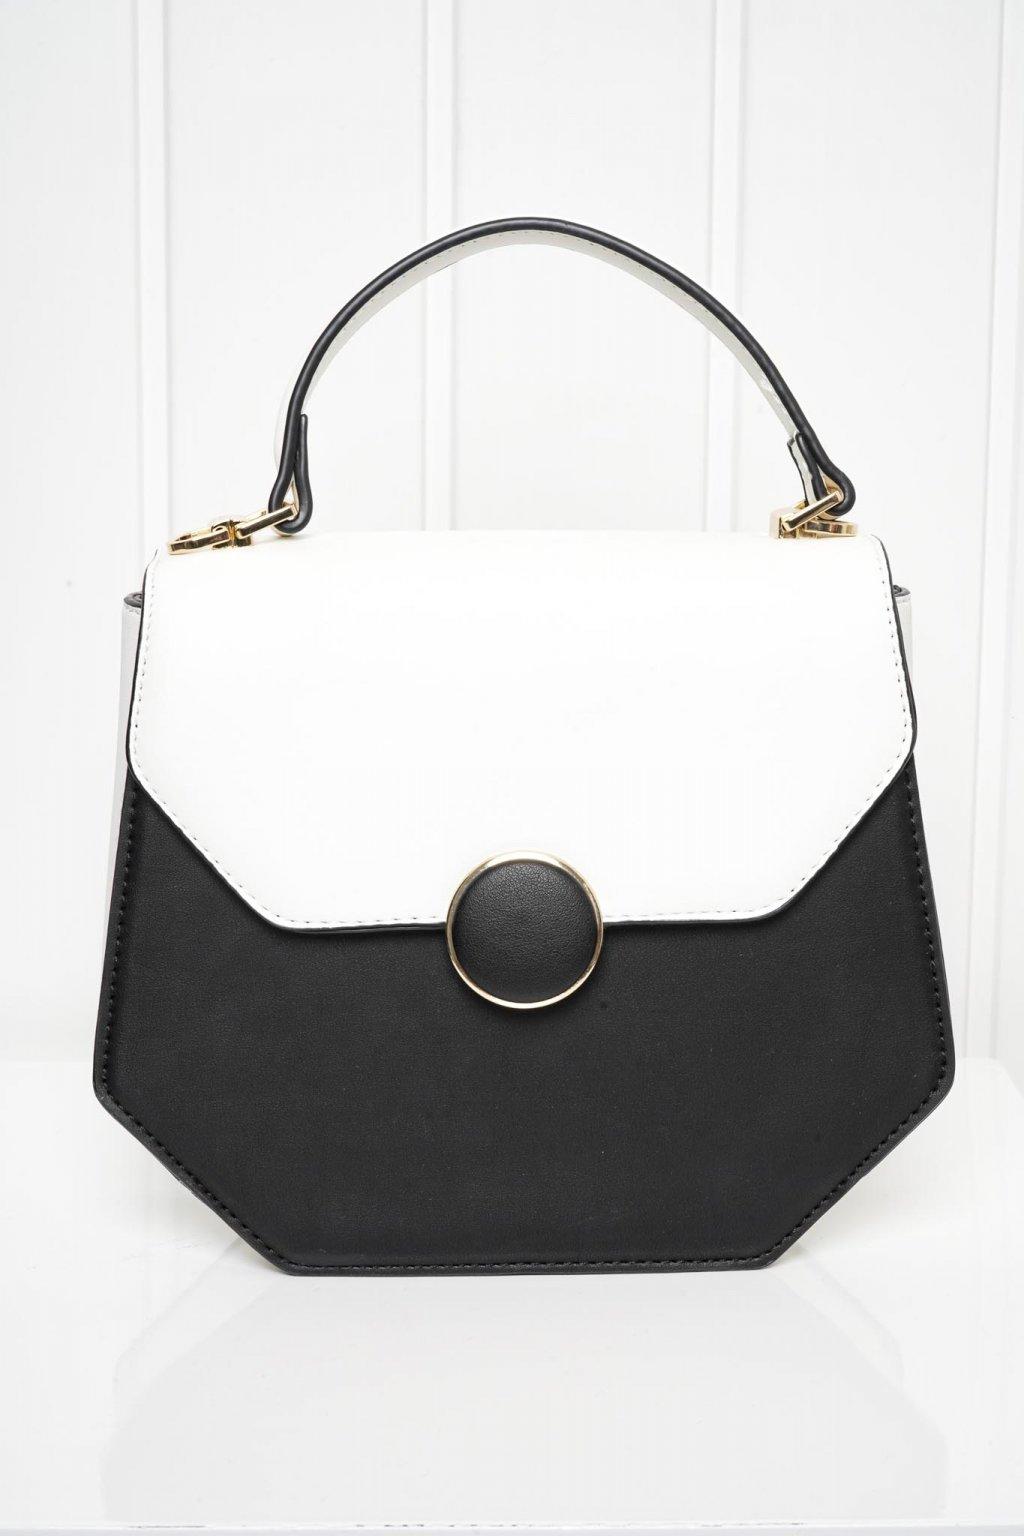 Kabelka, crossbody, ruksak, shopping bag, shopperka, 284